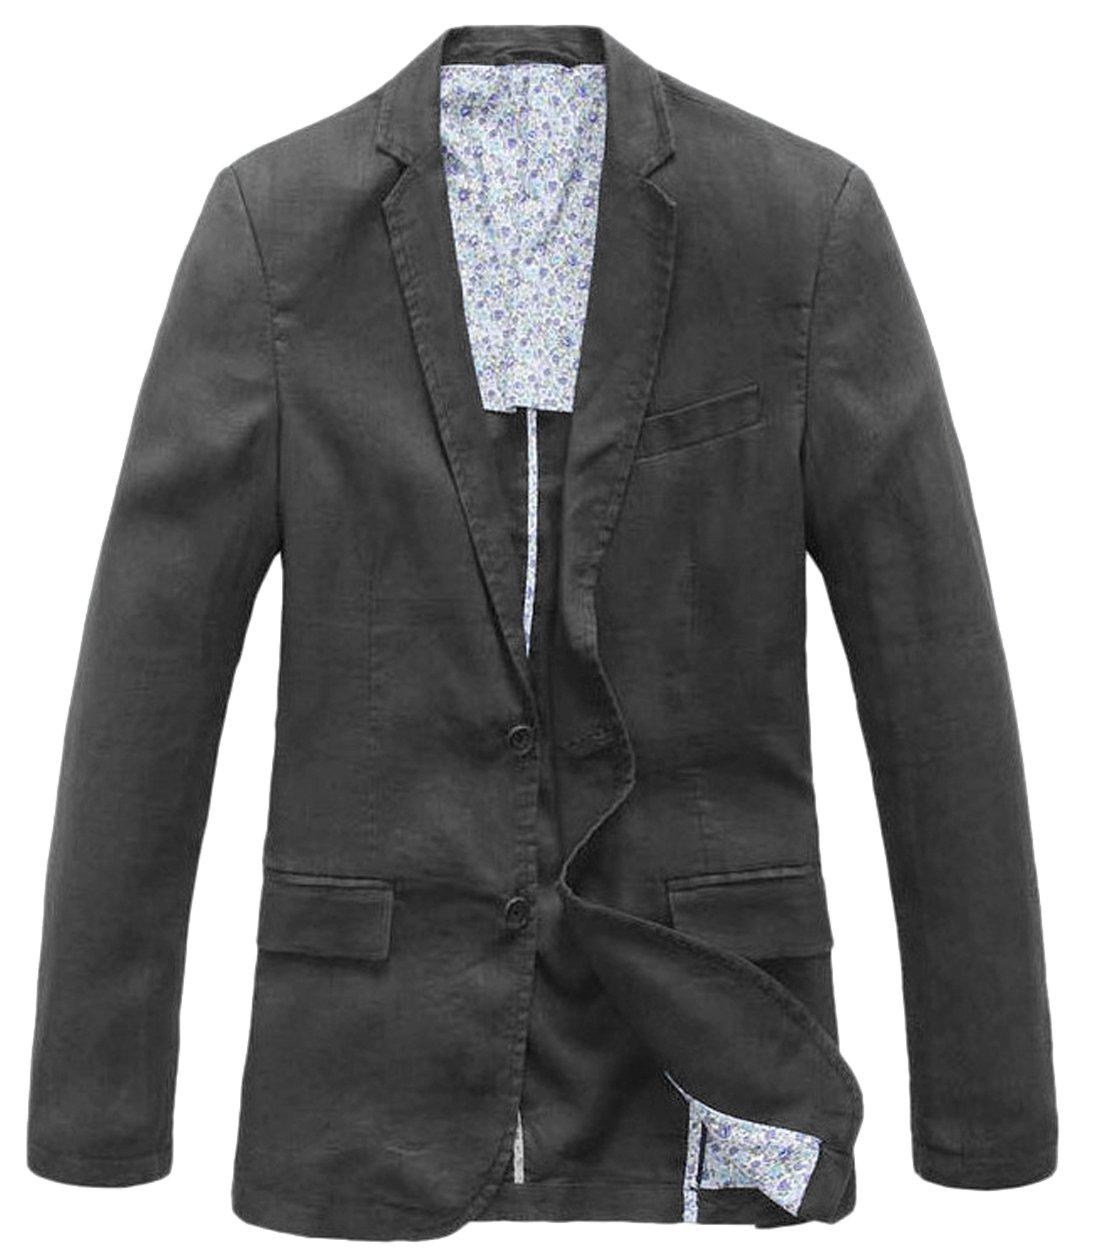 Chouyatou Men's Lightweight Half Lined Two-Button Suit Blazer (X-Large, Dark Grey)